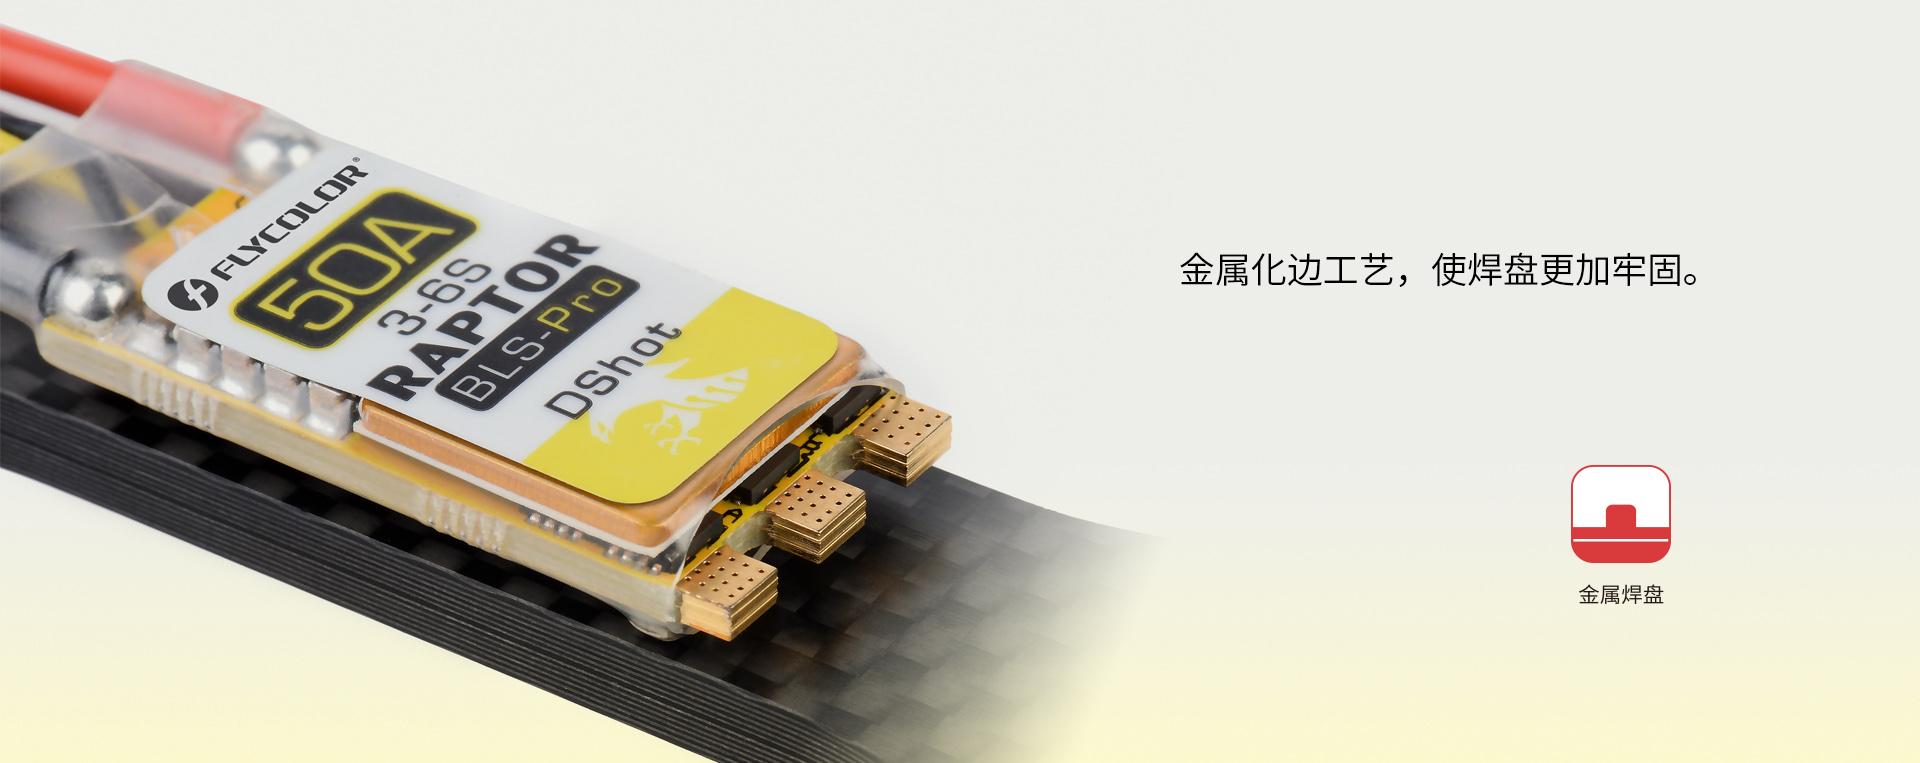 img-4-金属焊盘.jpg